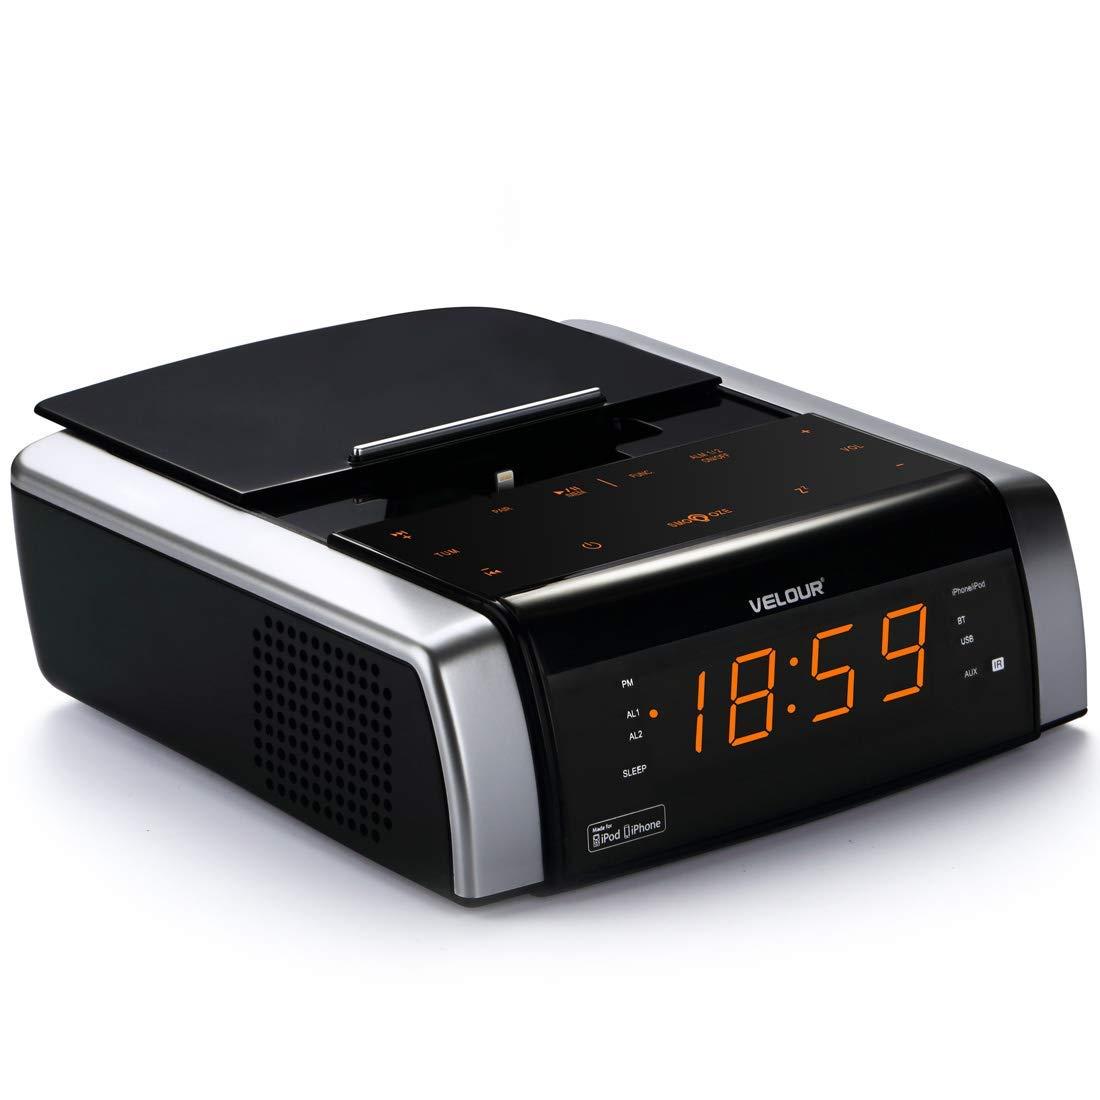 VELOUR YW-009 FM Clock Radio